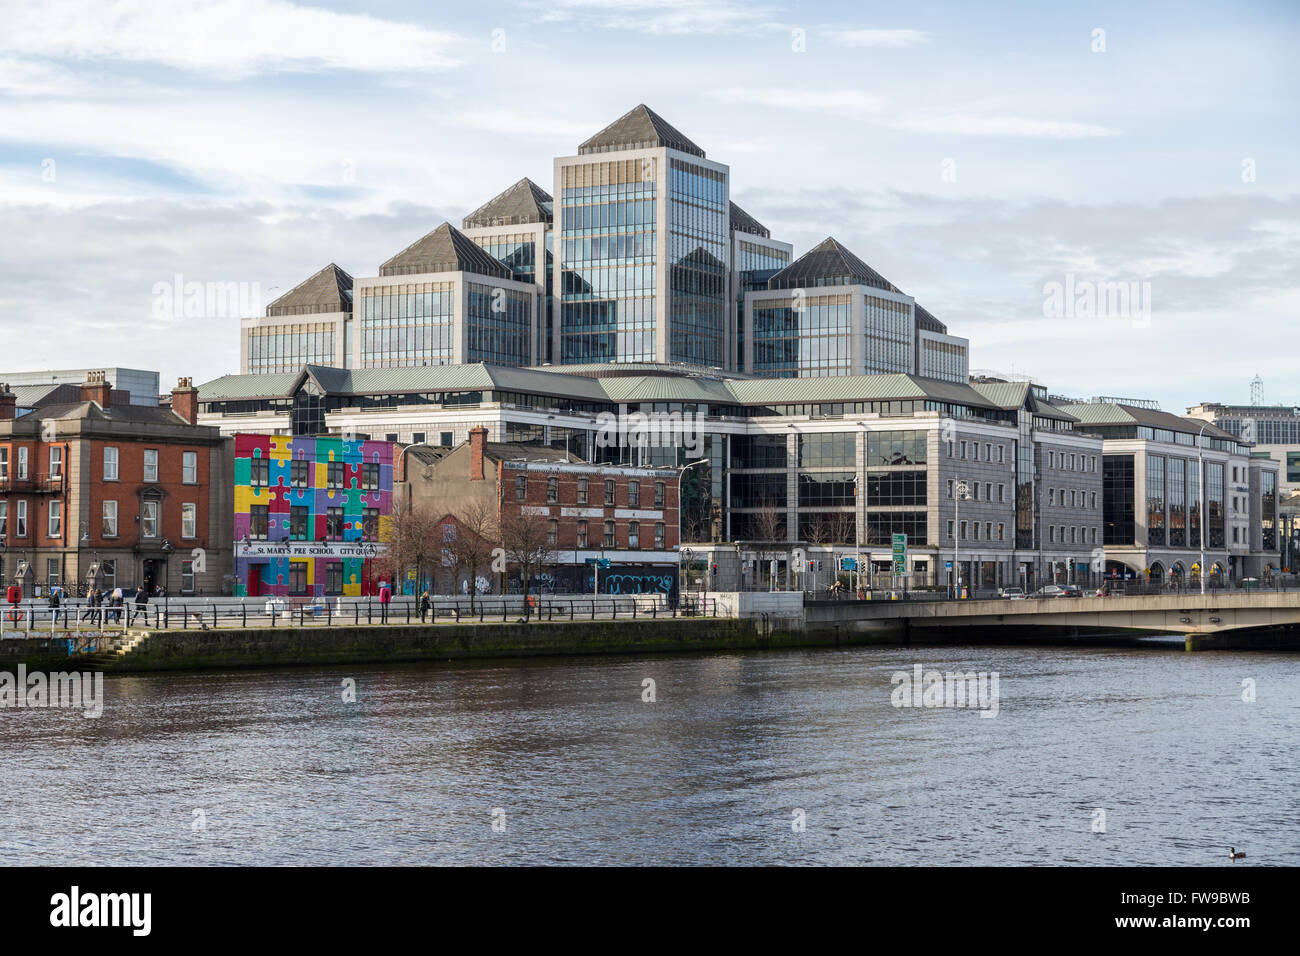 George's Quay Plaza on the Liffey bank, Dublin, Ireland - Stock Image